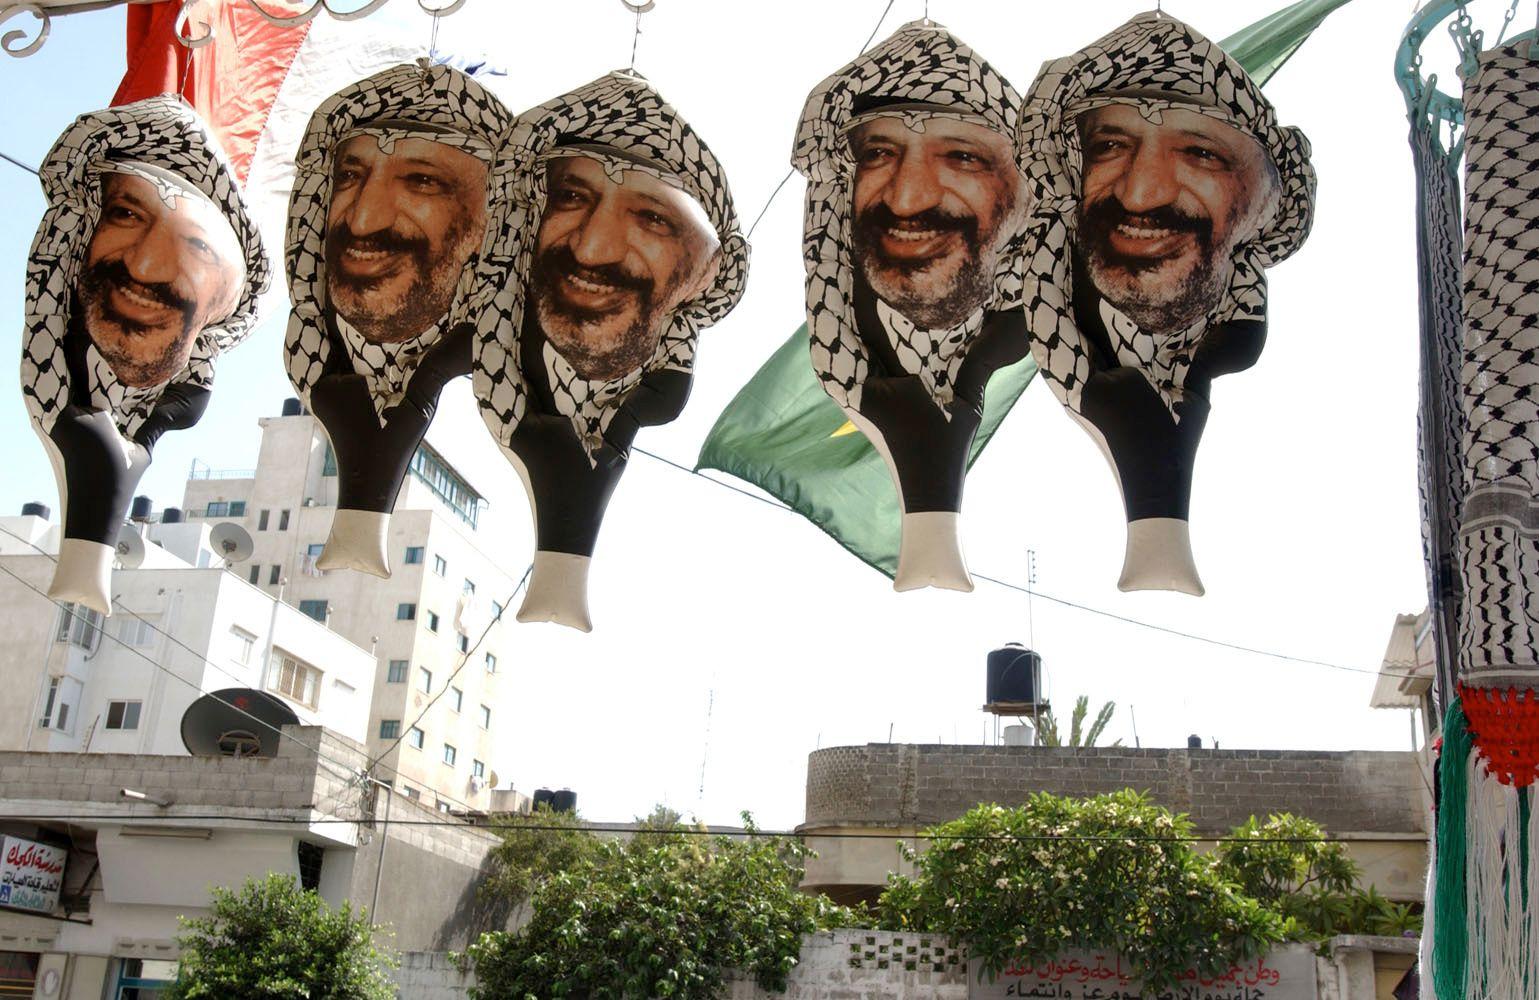 AUGUST 14, 2002  GAZA CITY